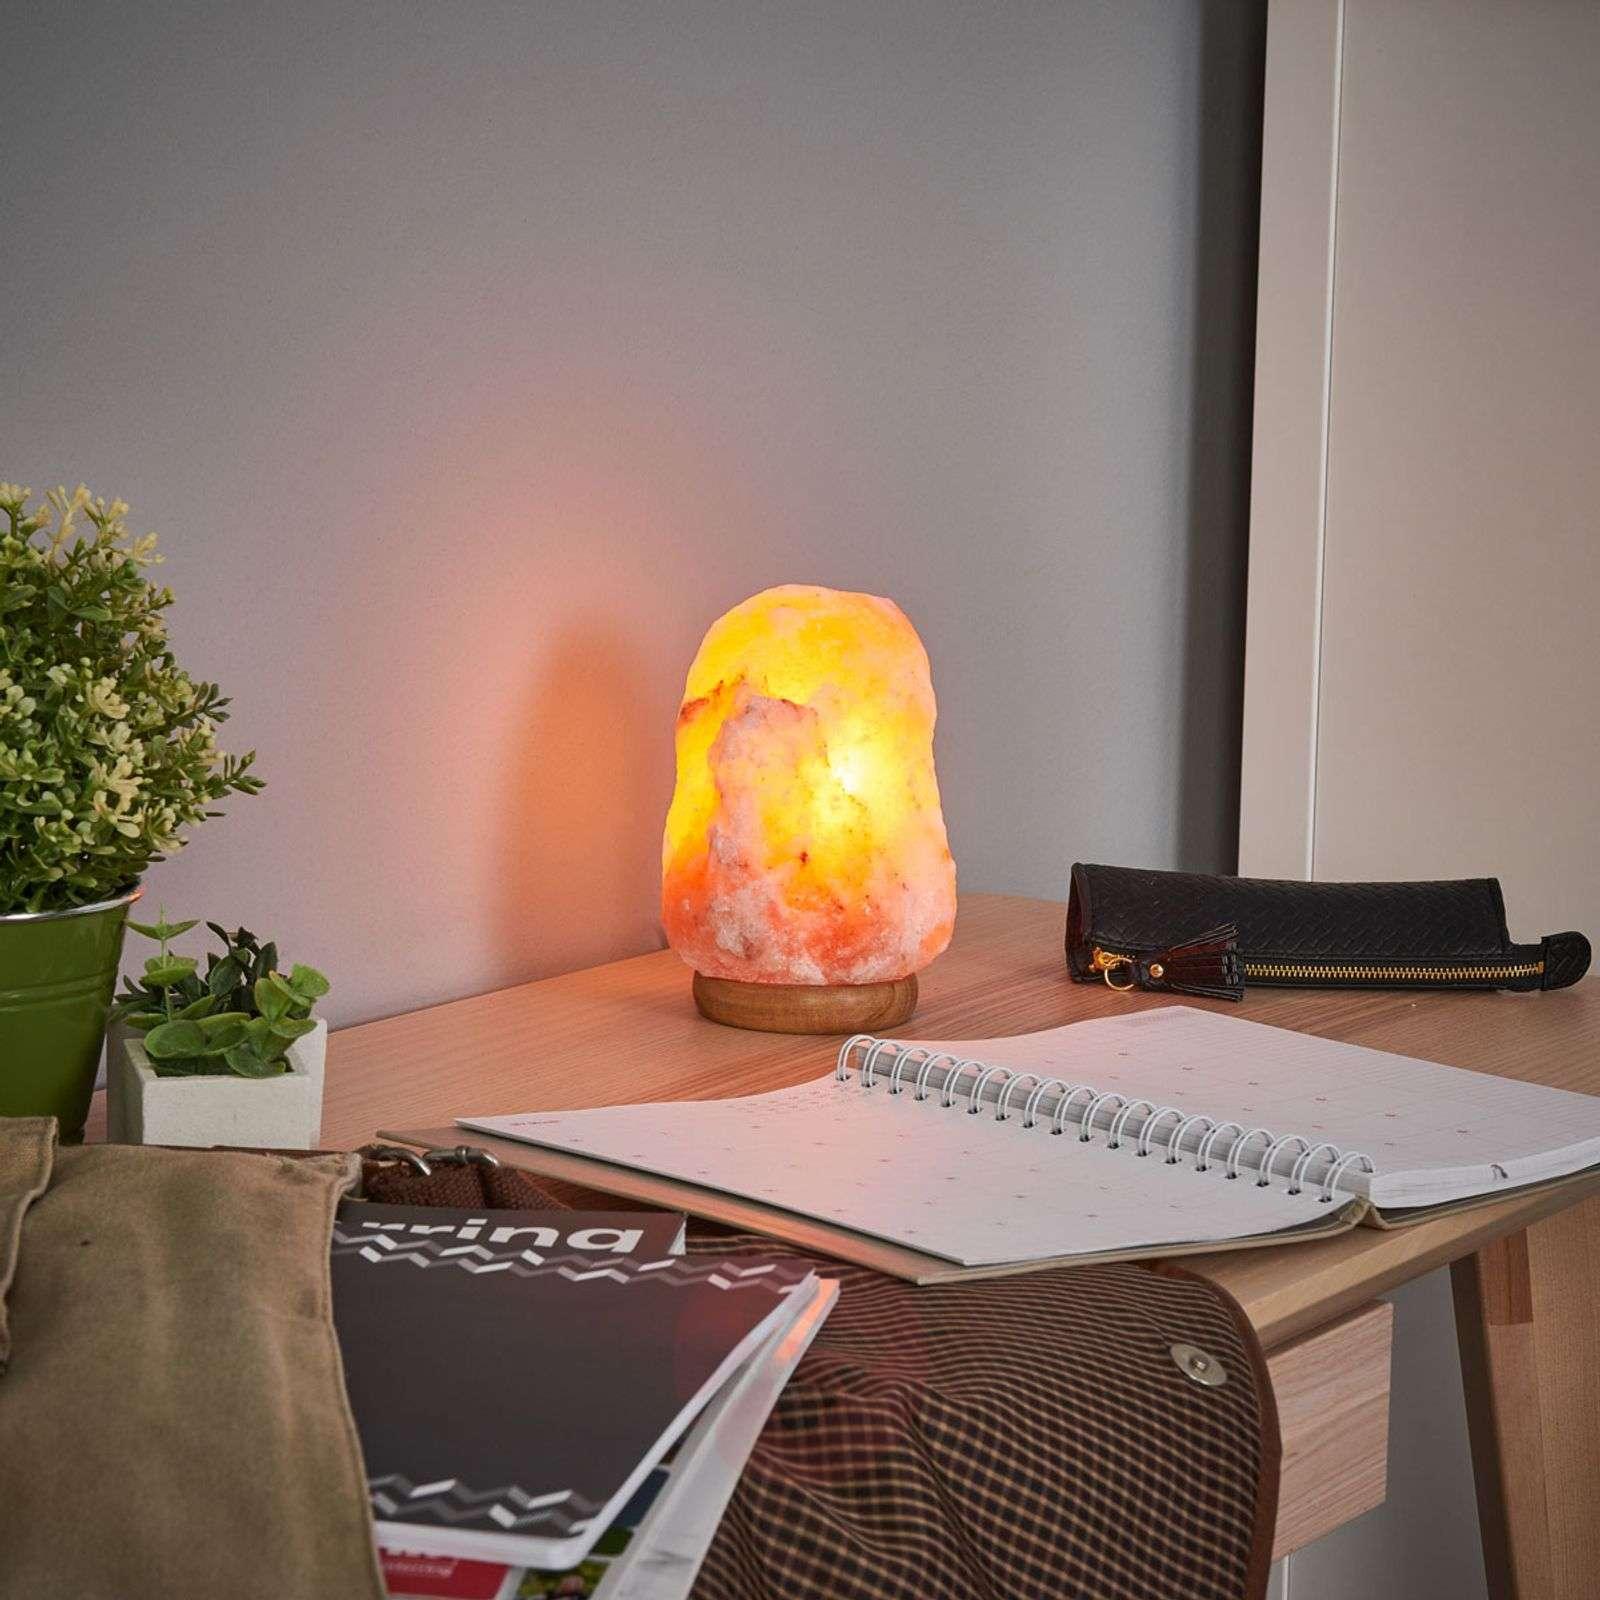 ROCK salt lamp emits wellness light 3kg-9608001-02